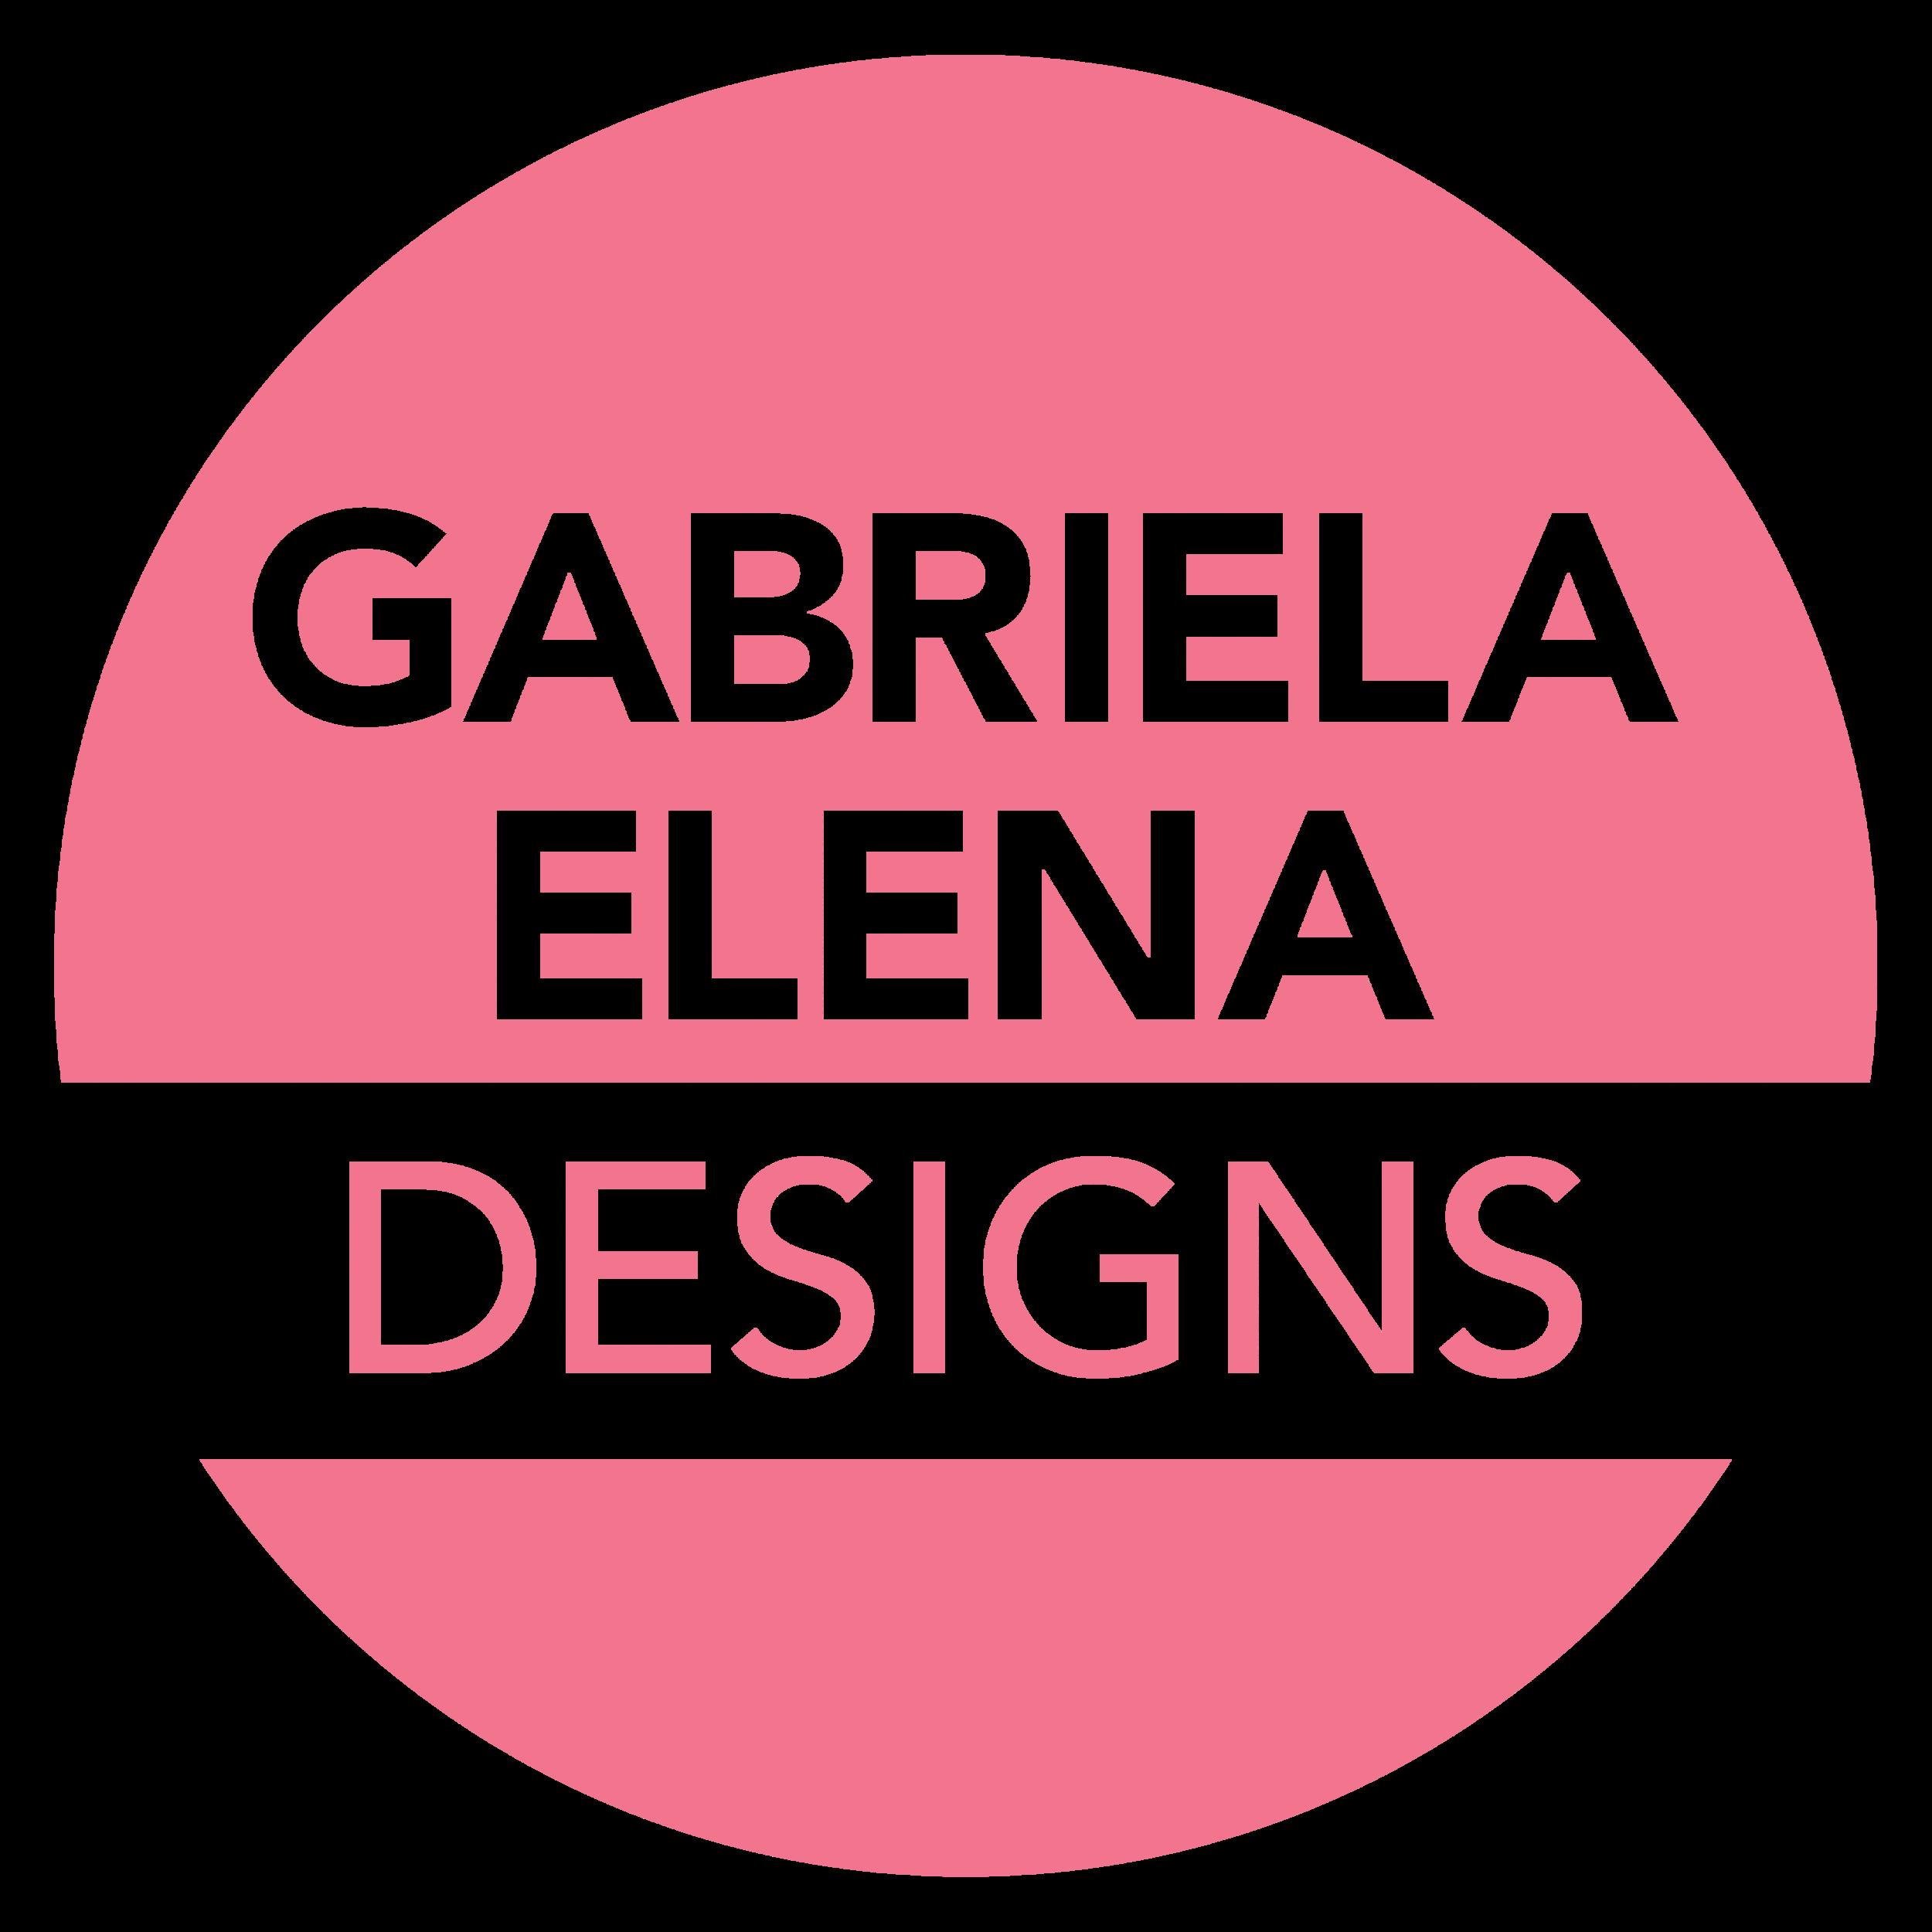 Gabriela Elena Designsgabrielaelenadesigns.png